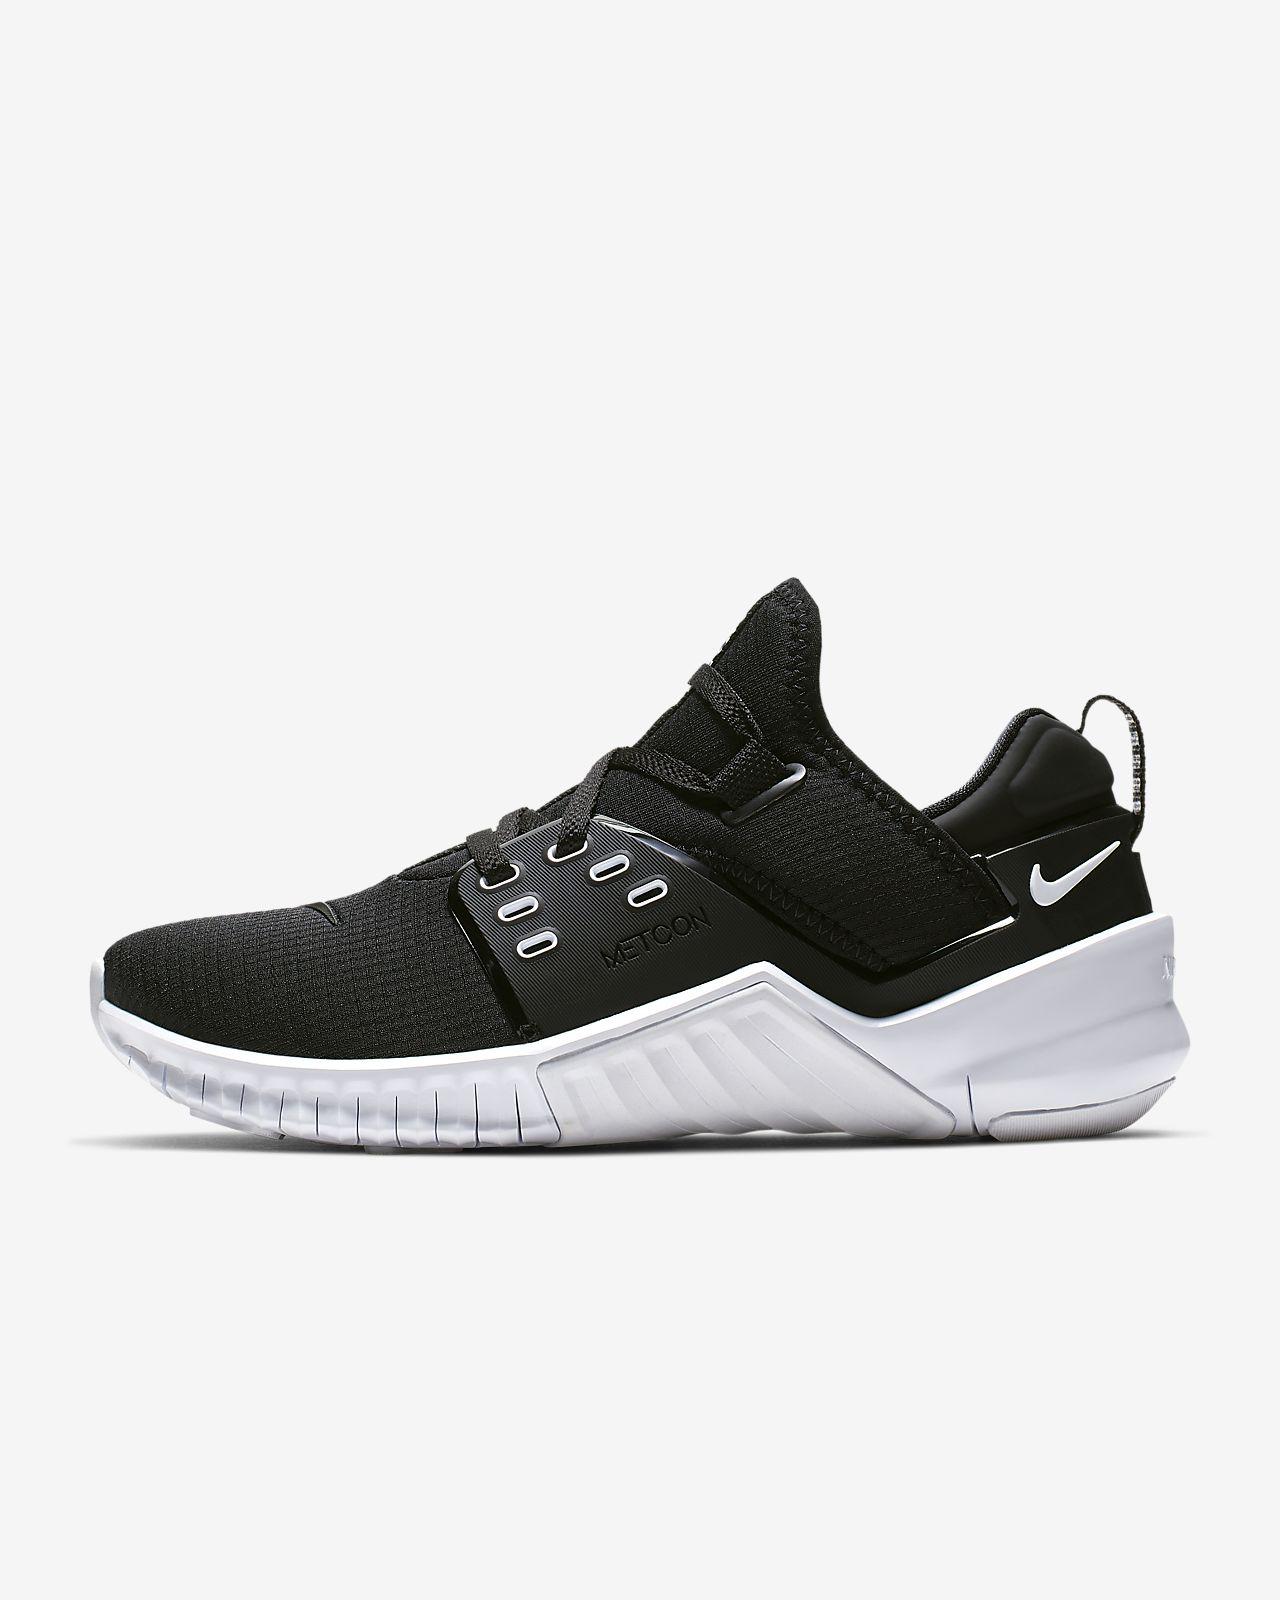 b340e0ad9b9 Nike Free X Metcon 2 Women s Training Shoe. Nike.com